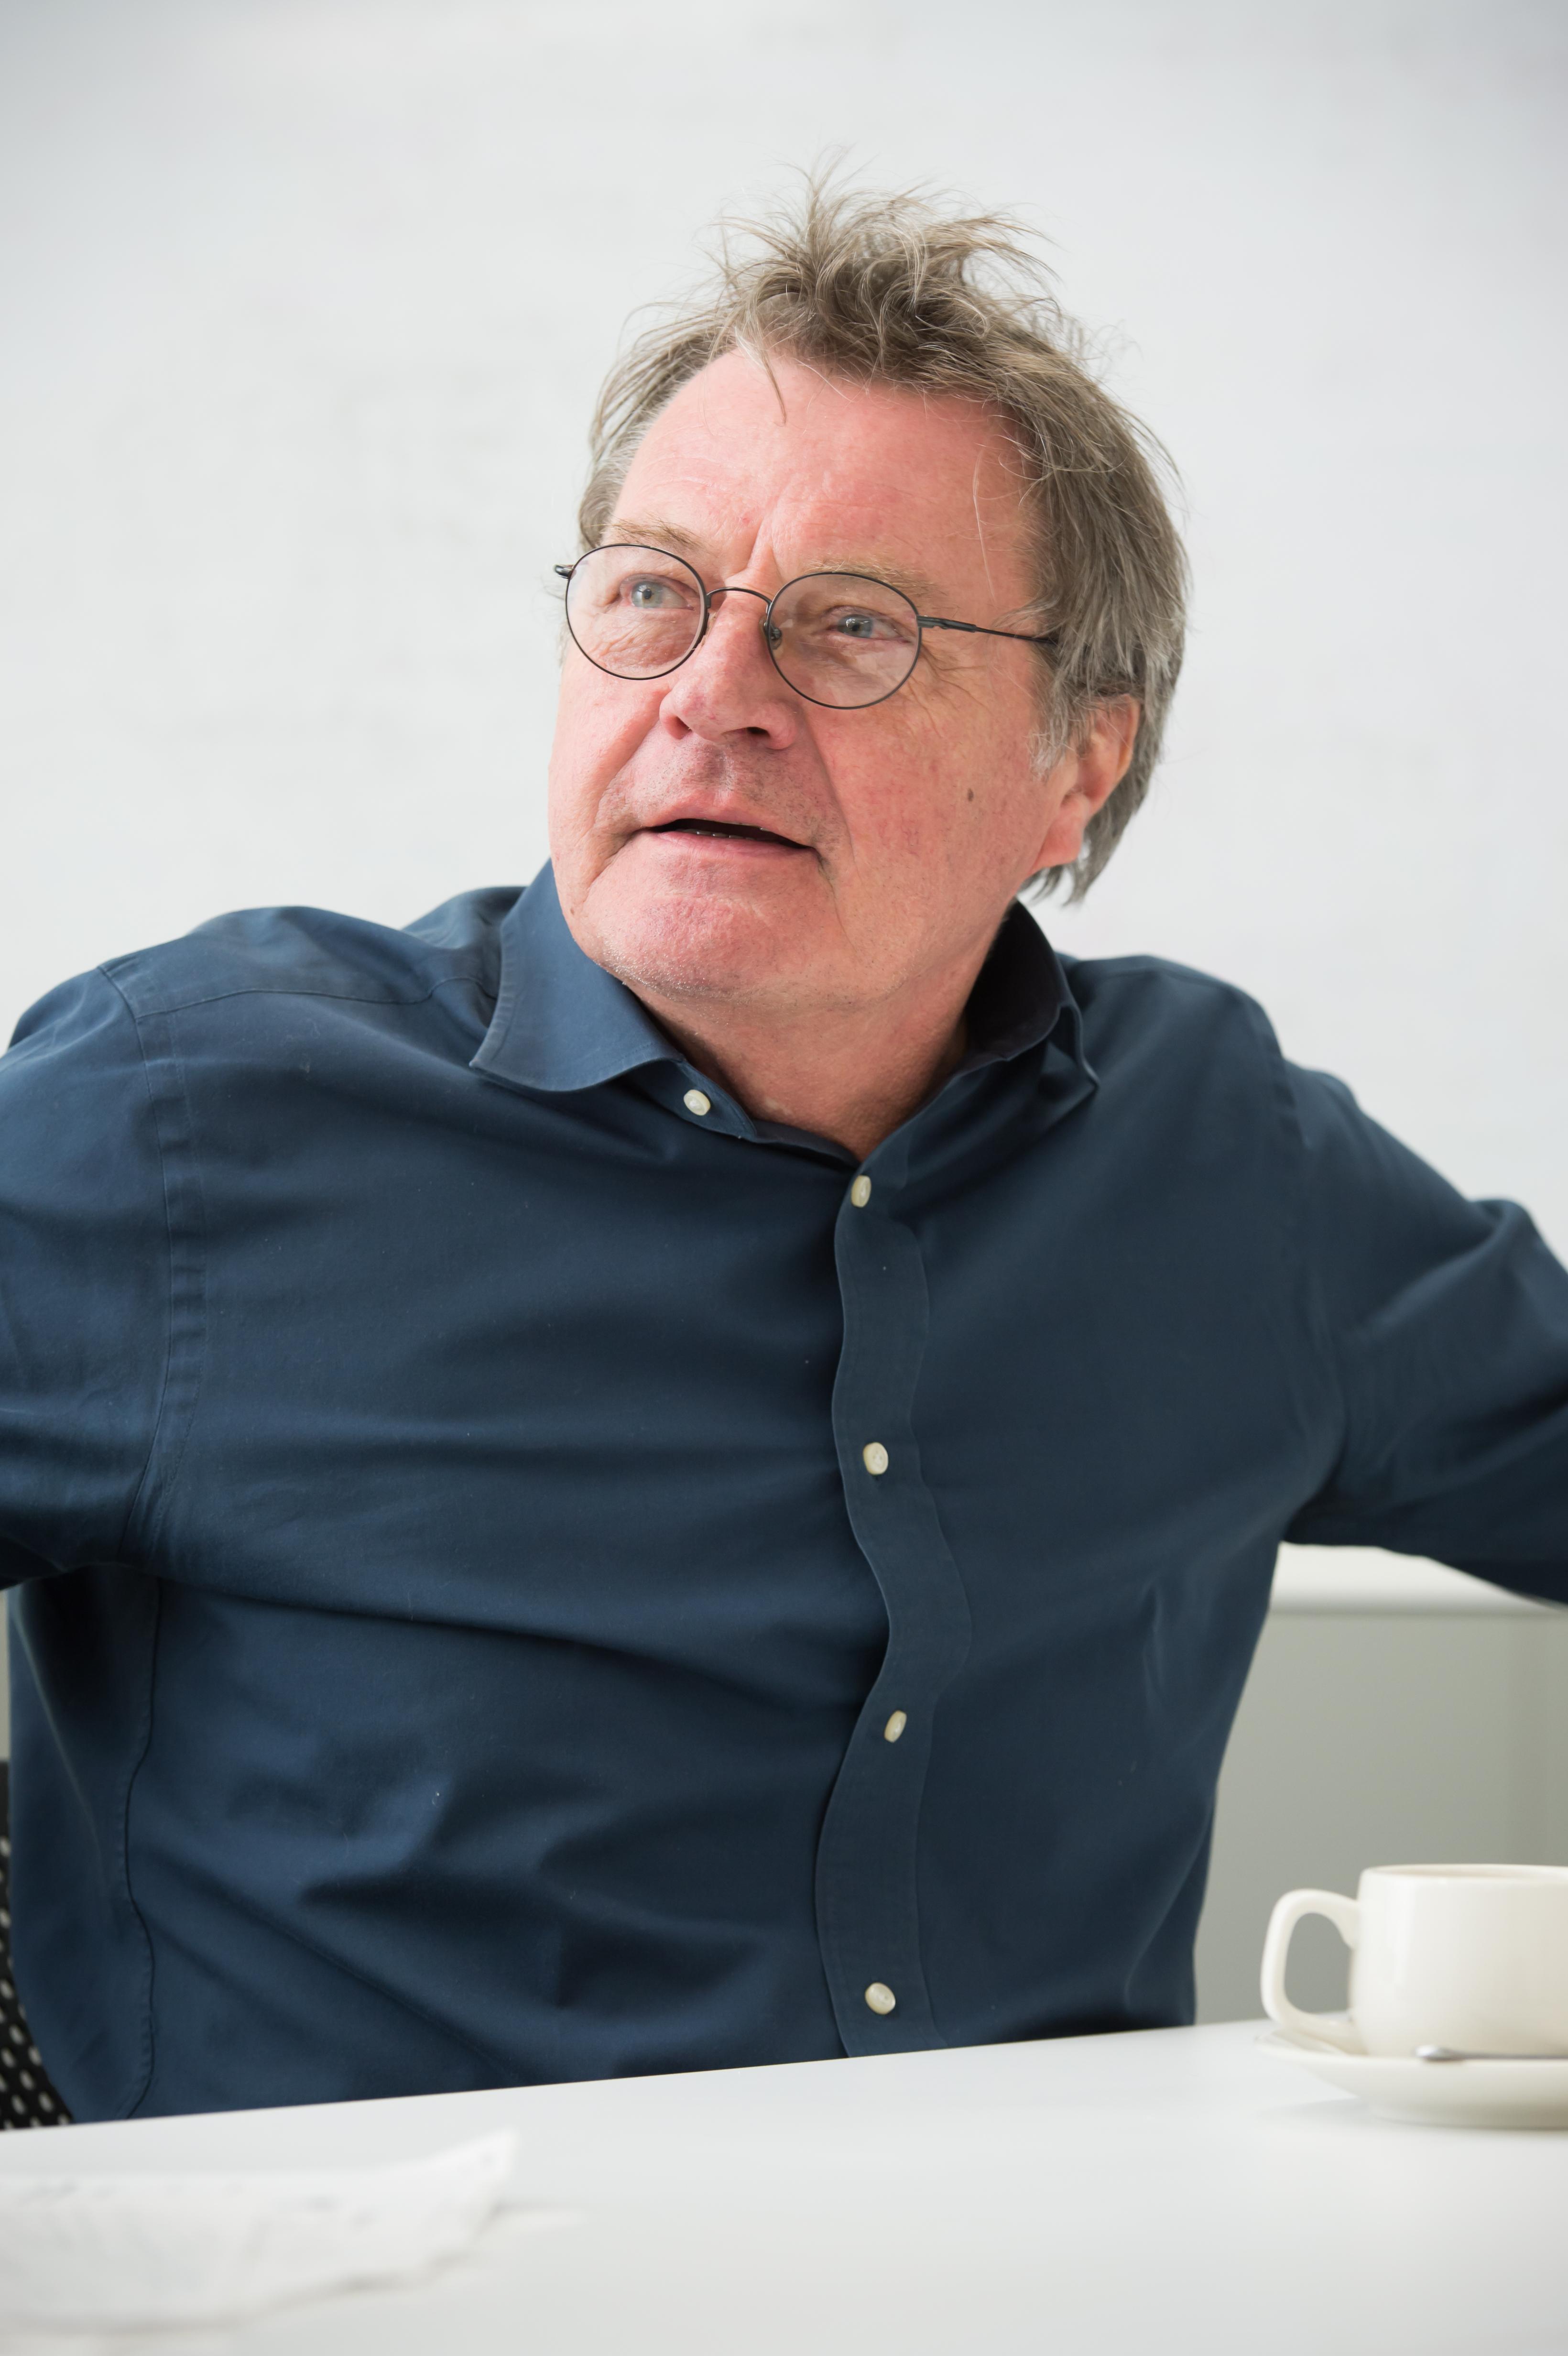 James K Gimzewski